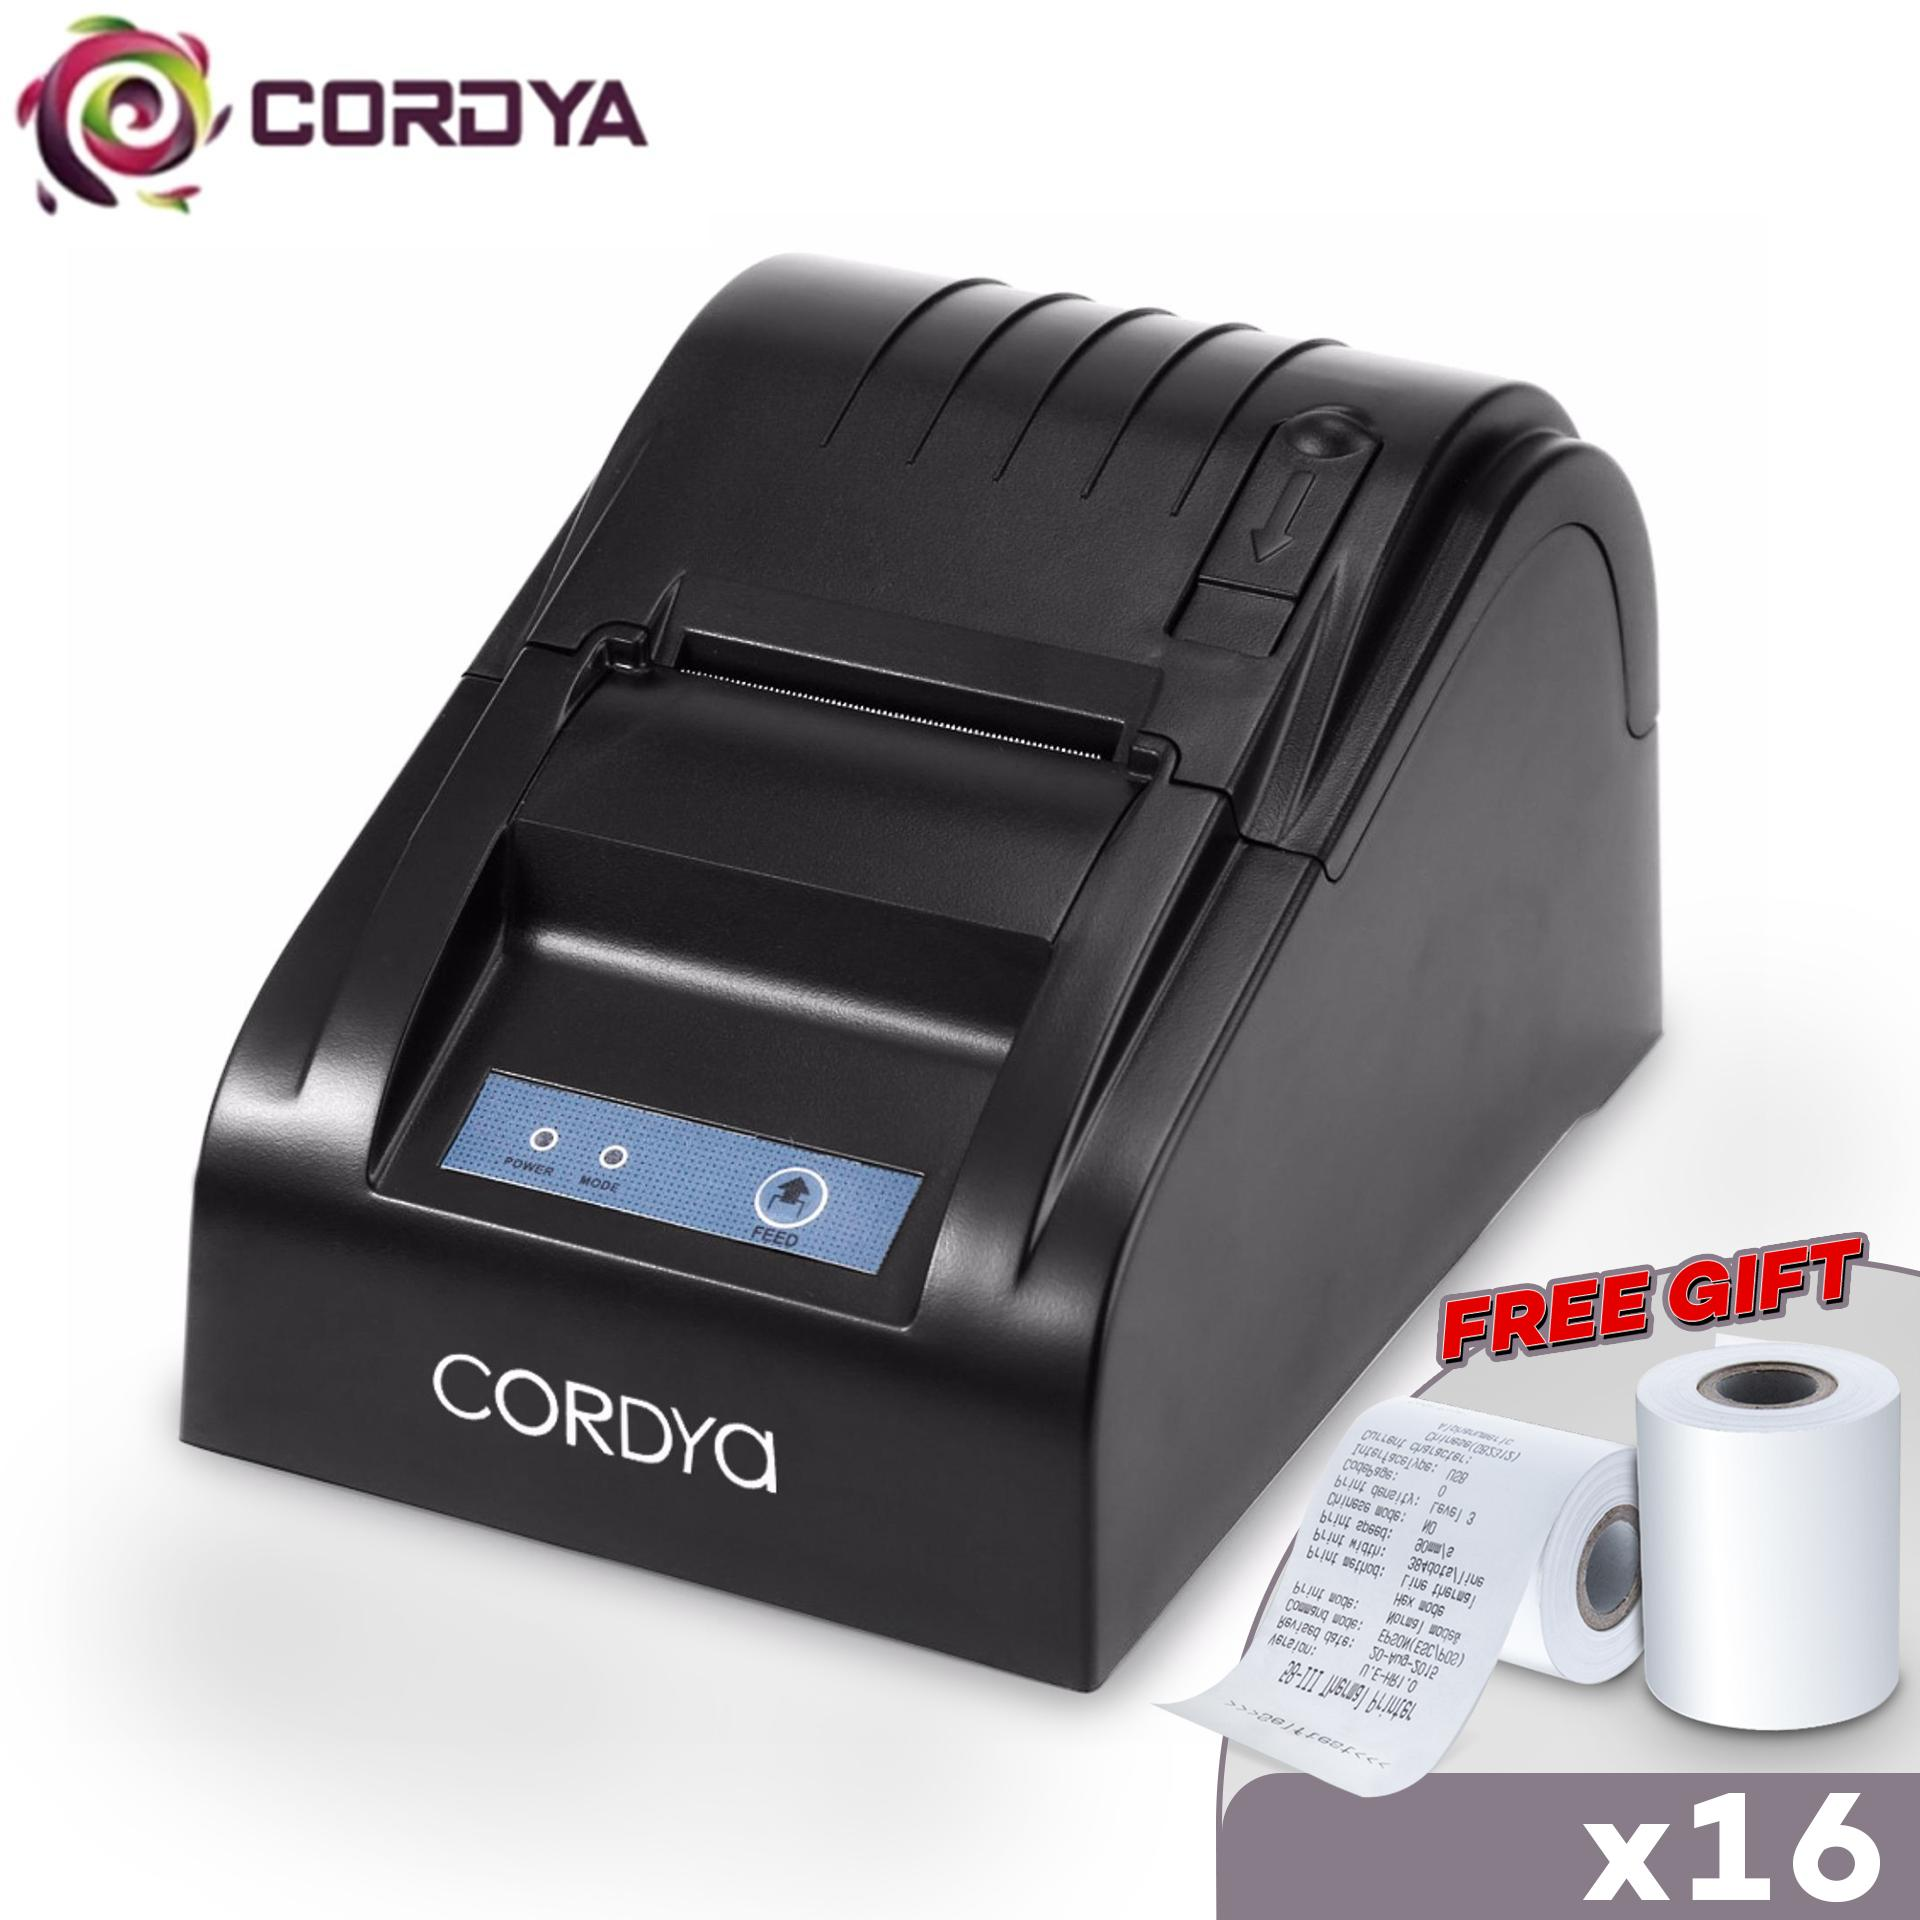 Cordya POS 5890T Portable 58mm USB Port POS Receipt Thermal Printer Black